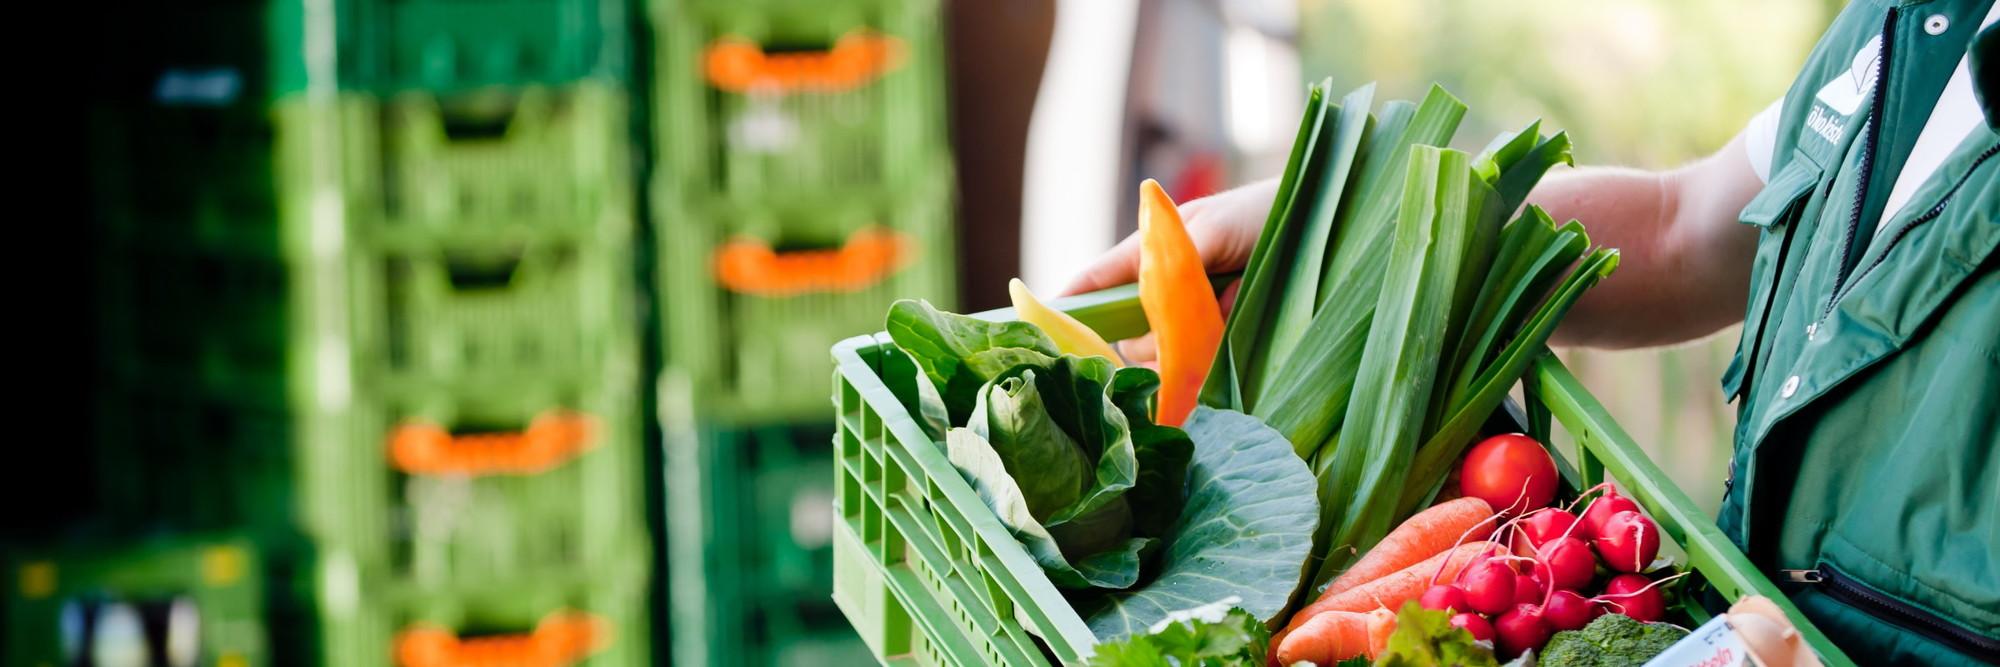 Eine grüne NAPF-Kiste voller Gemüse